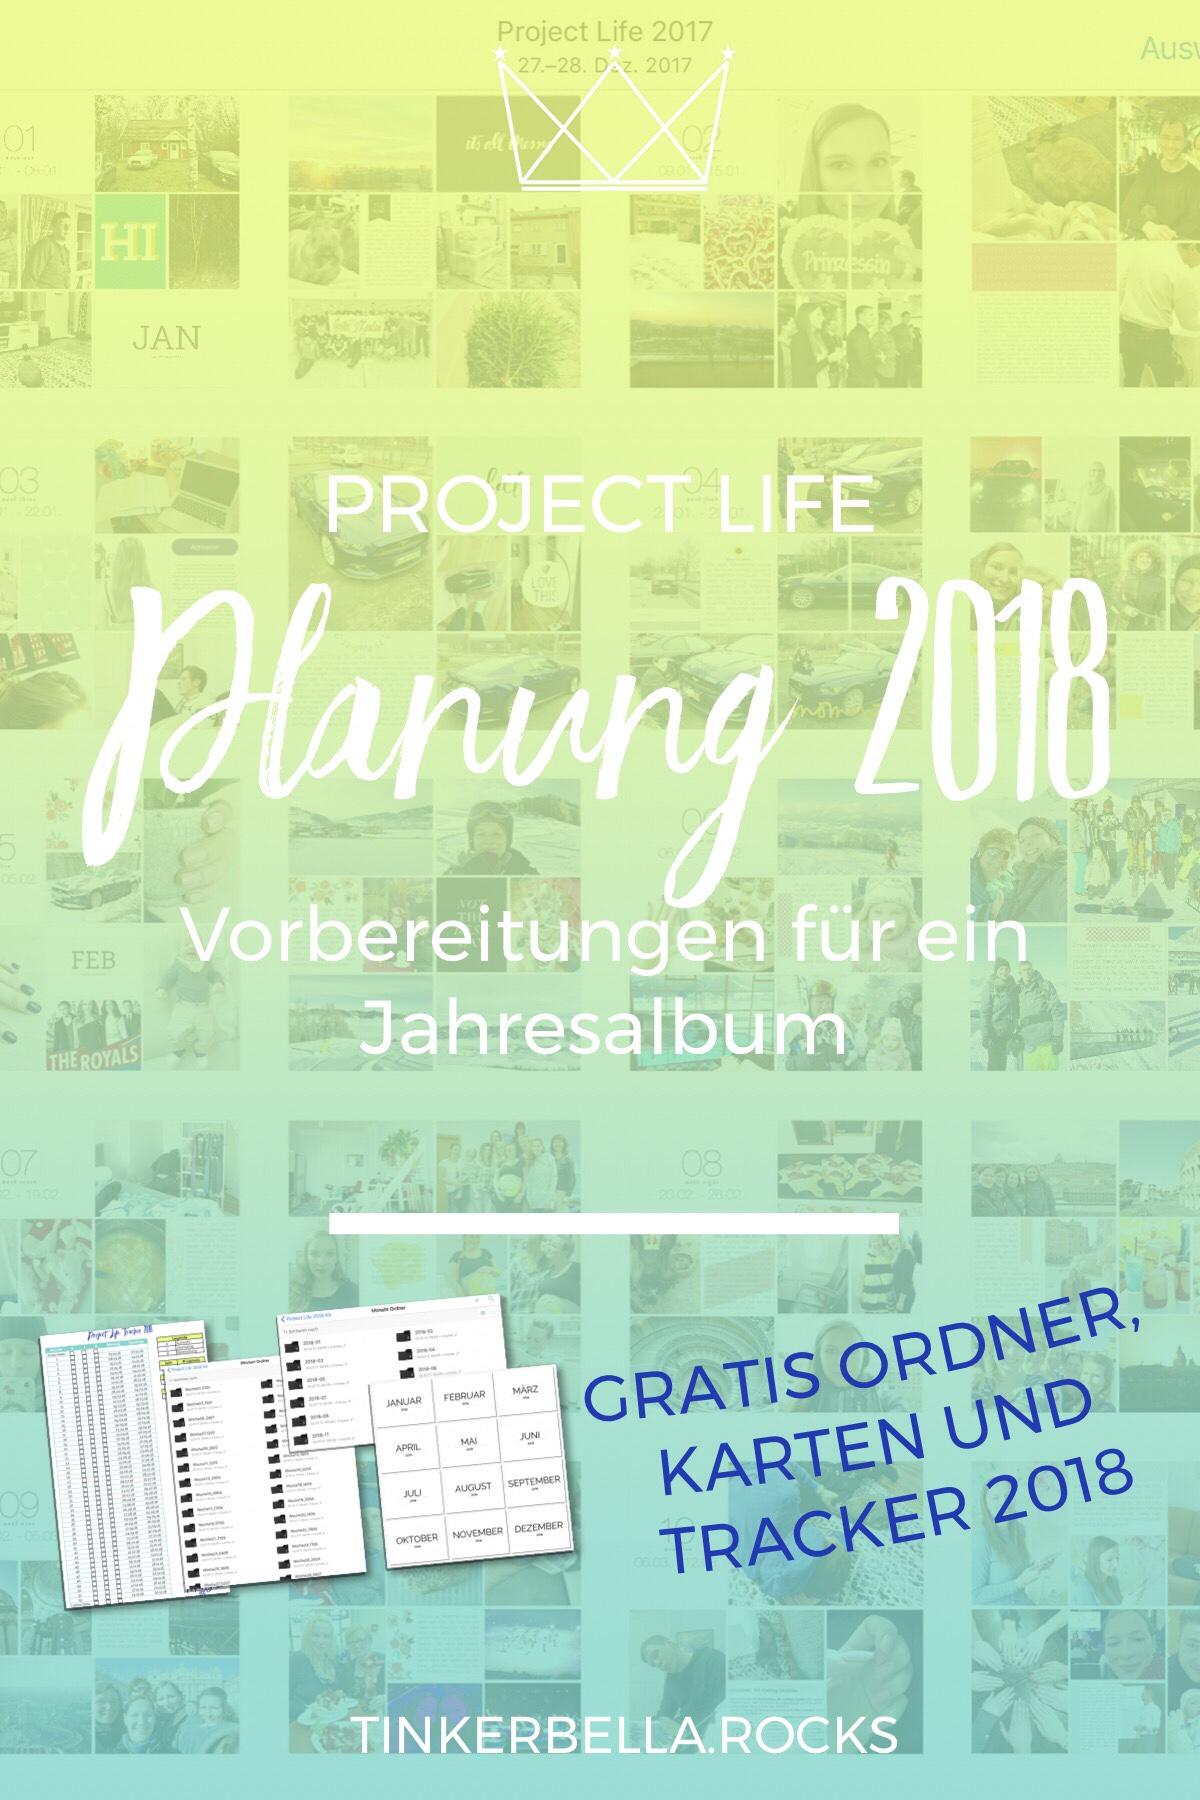 Project Life Planung 2018 - Vorbereitung Jahresalbum